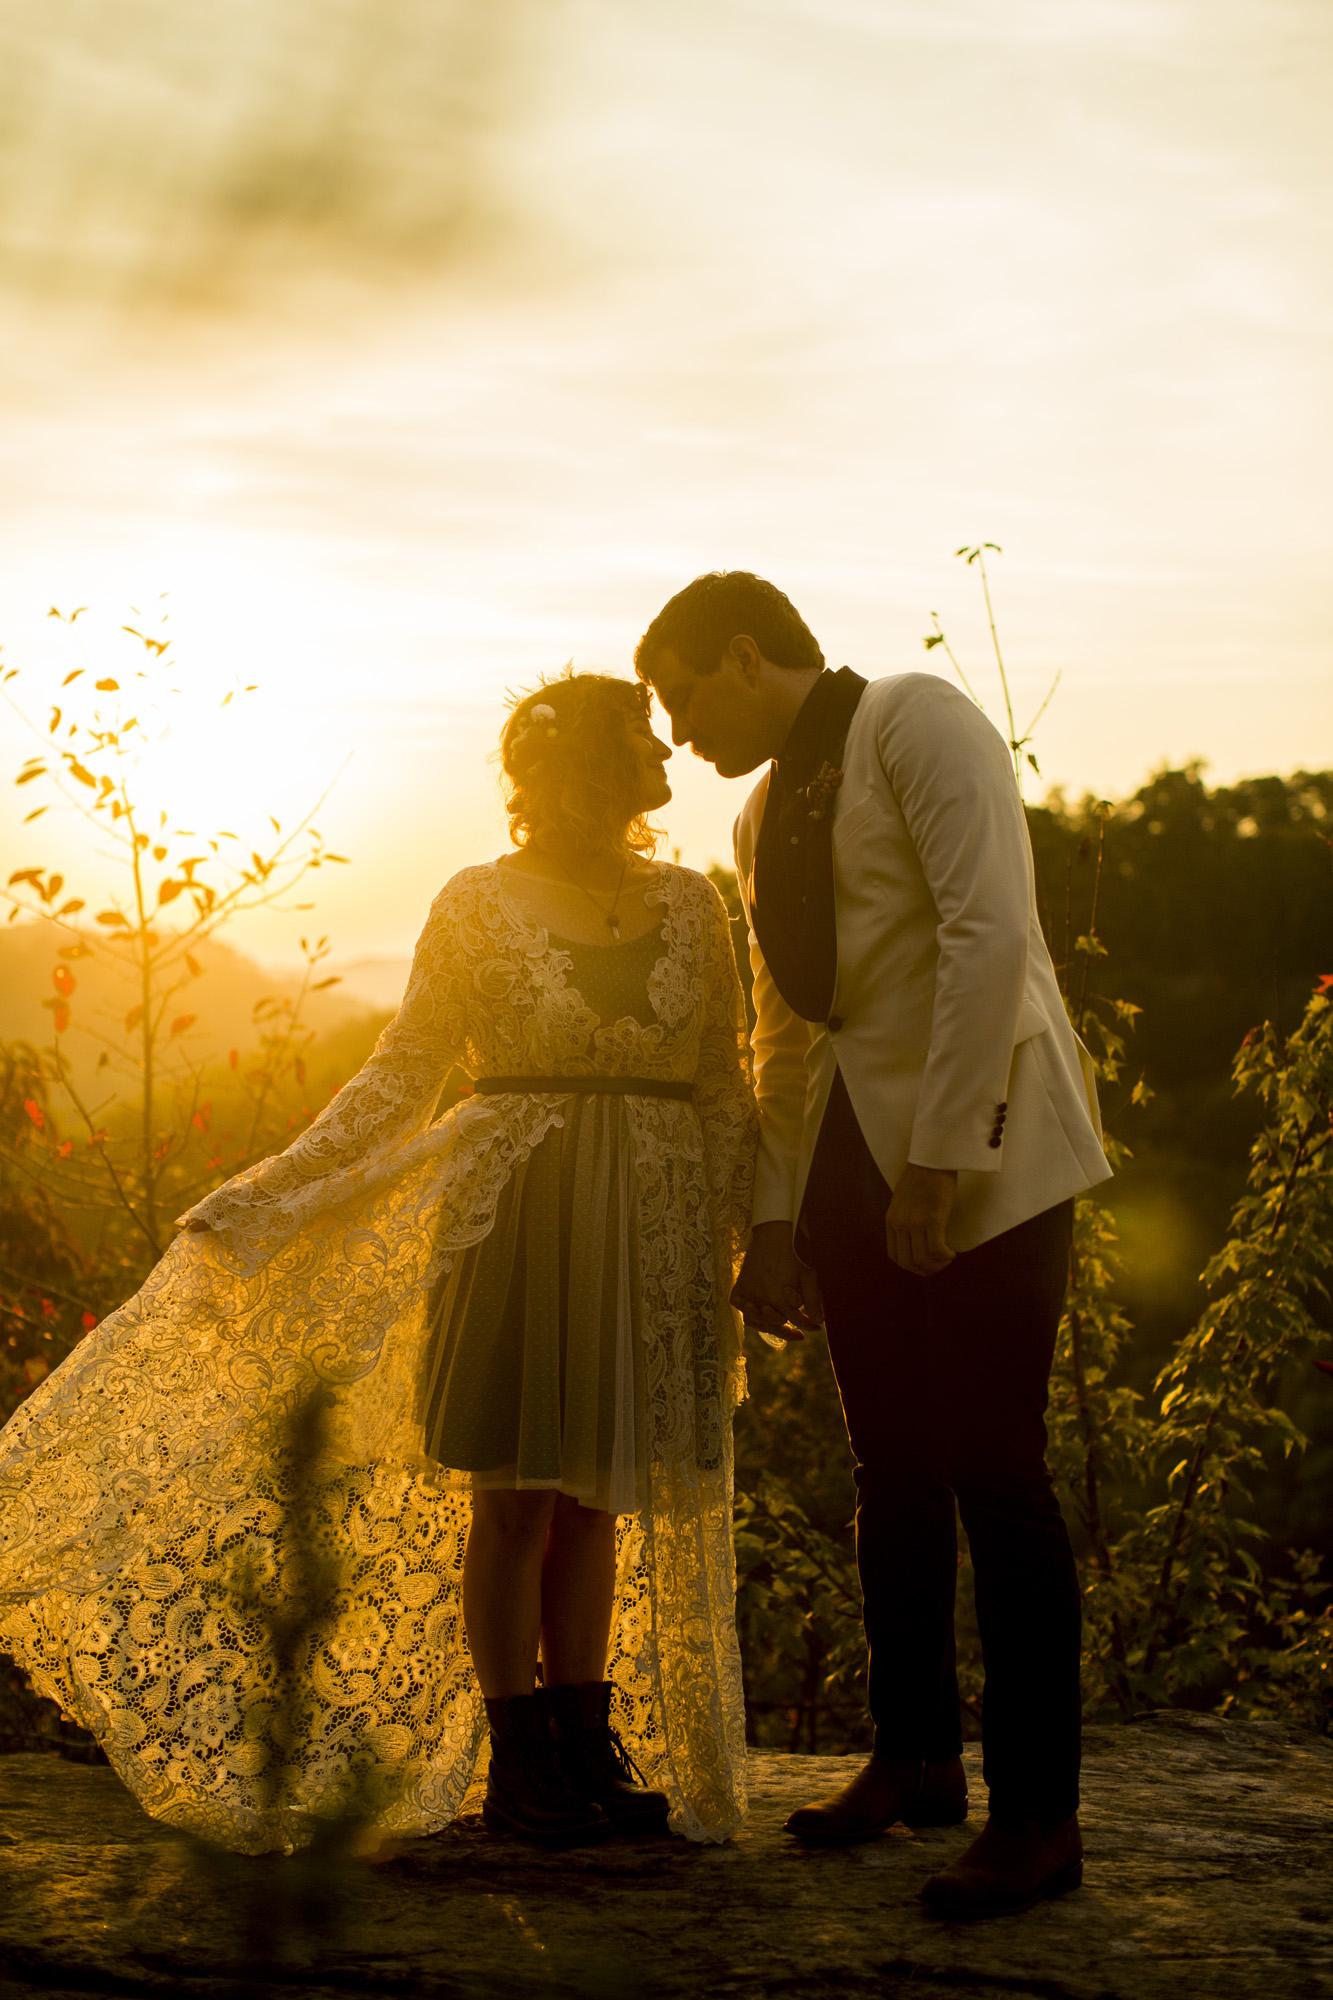 Seriously_Sabrina_Photography_Red_River_Gorge_Kentucky_Wedding_ShawnDana163.jpg